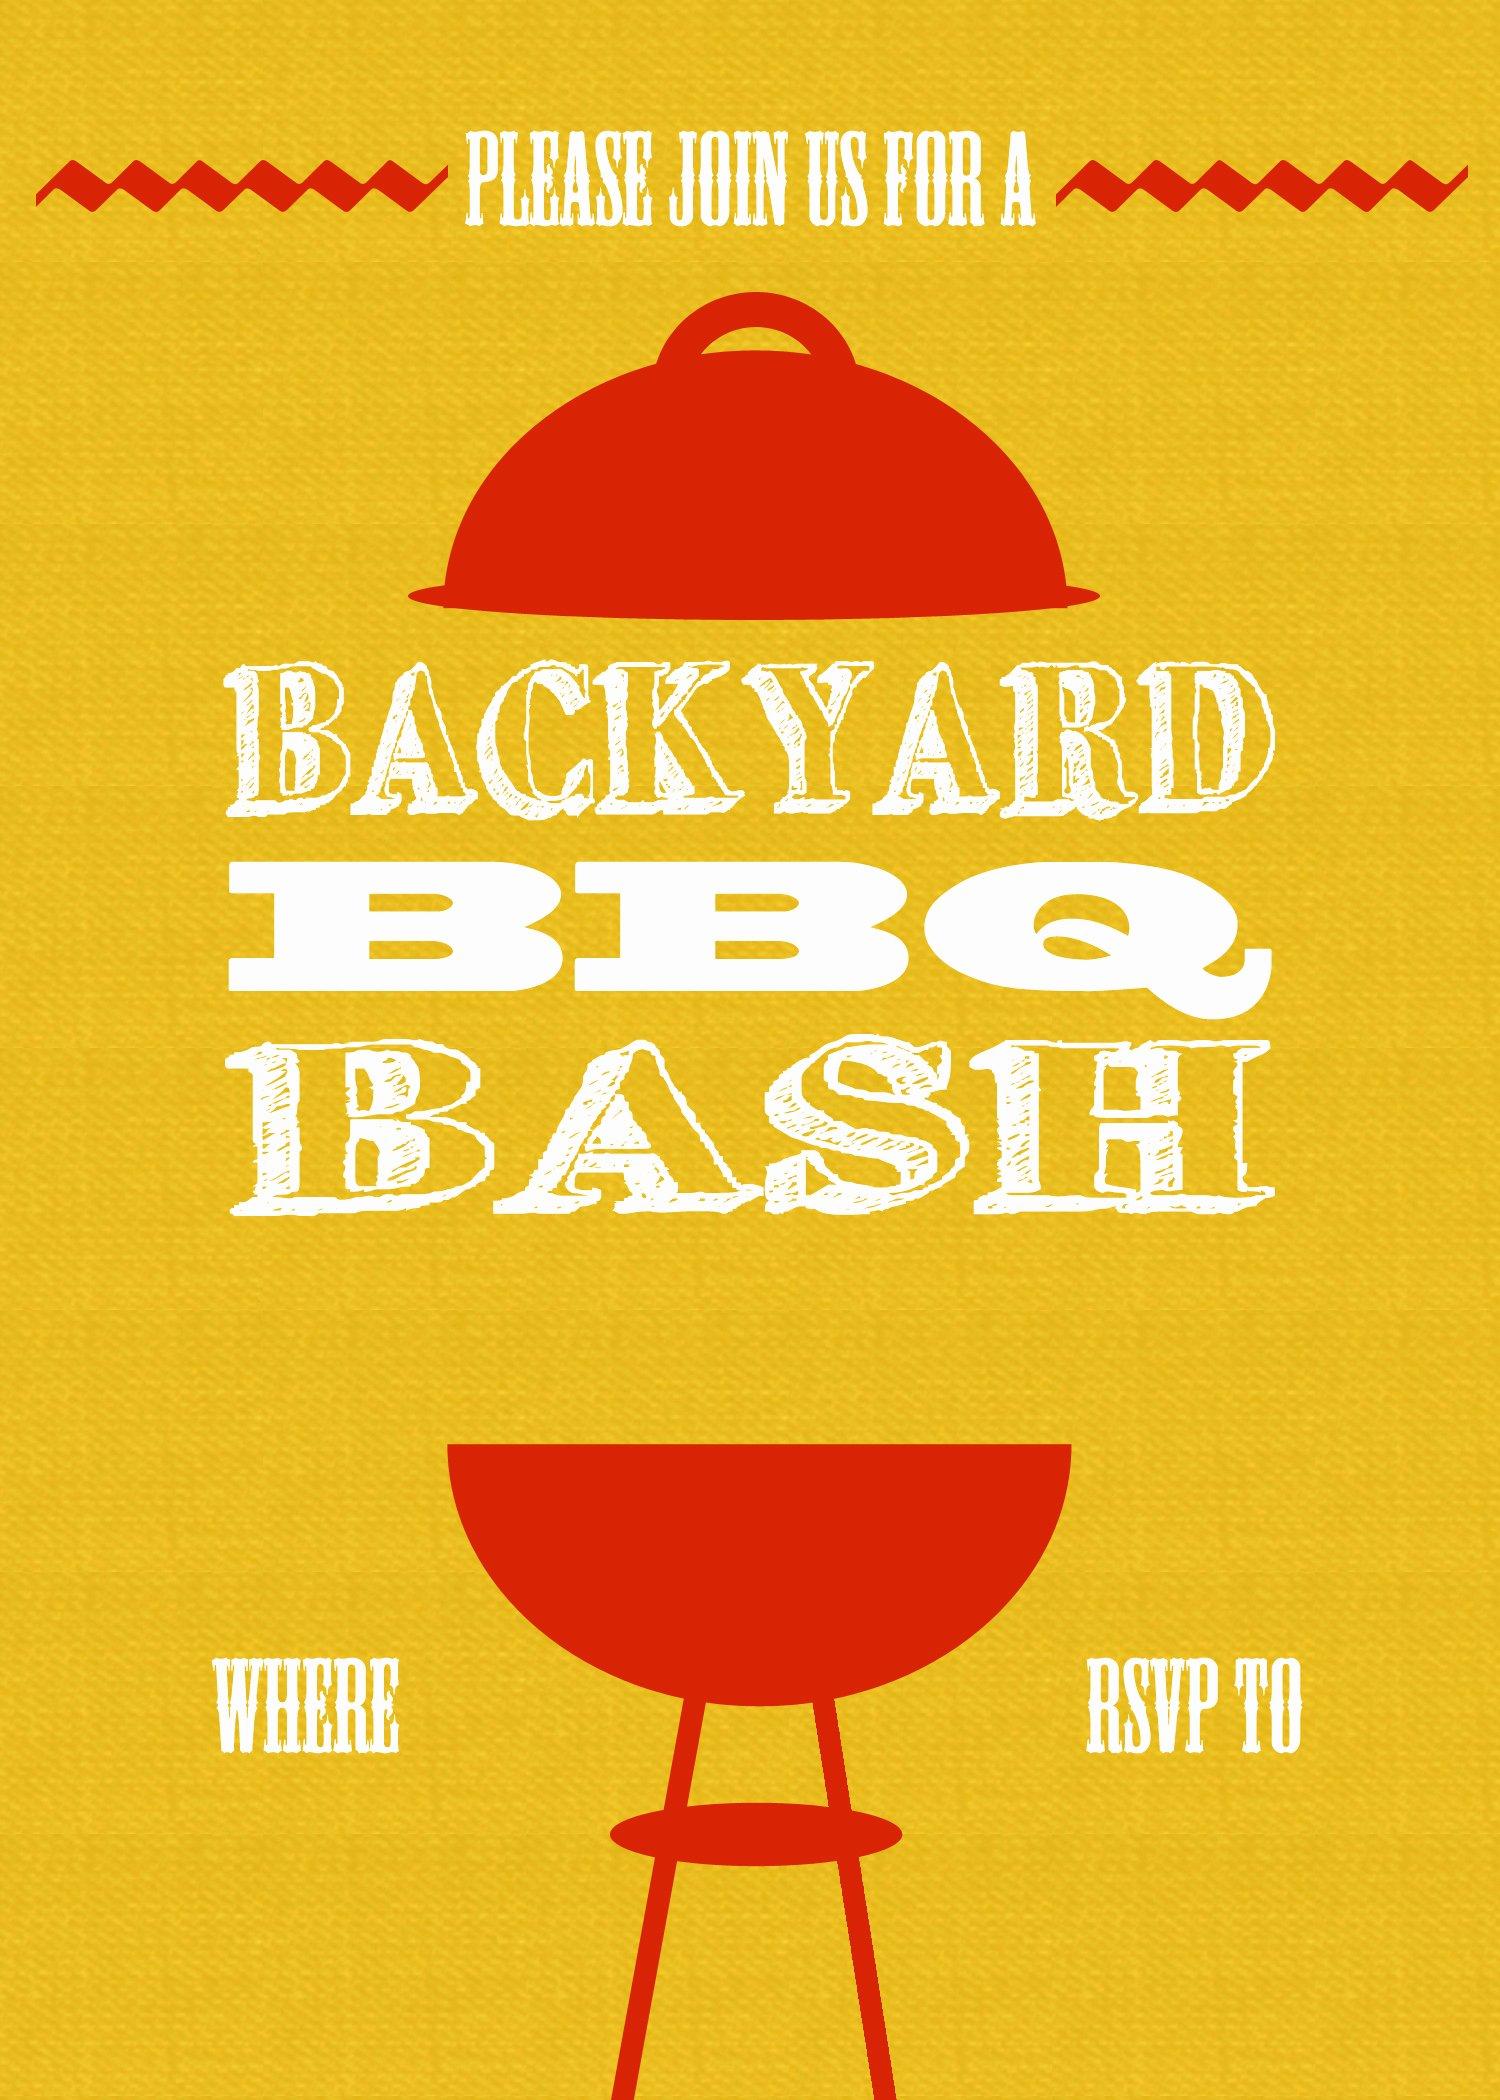 Bbq Invitation Template Word Elegant Diy Printable Backyard Bbq Bash Invite